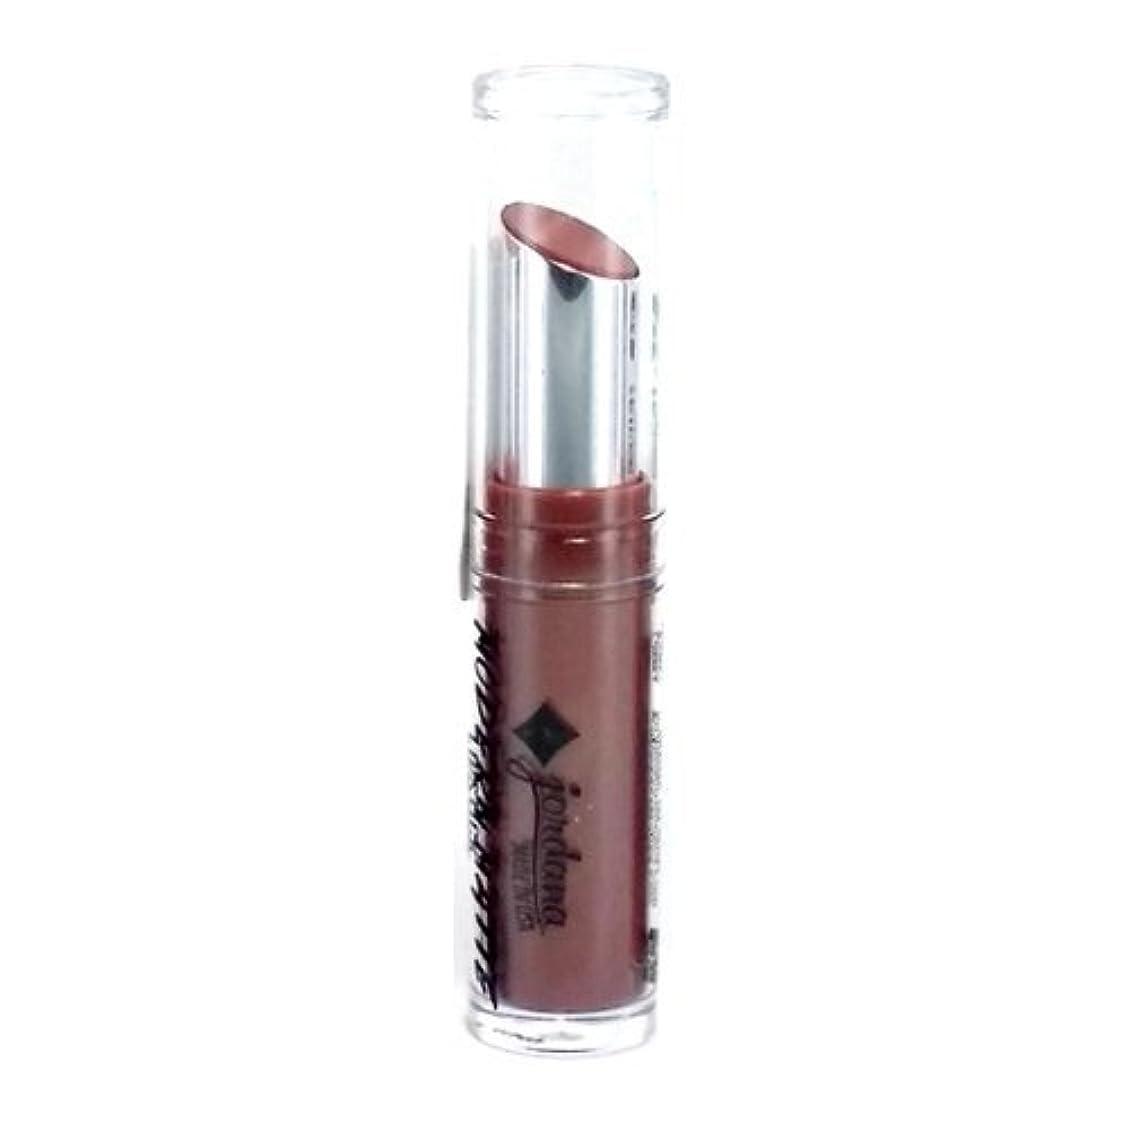 JORDANA Modern Matte Lipstick Matte Frappuccino (並行輸入品)